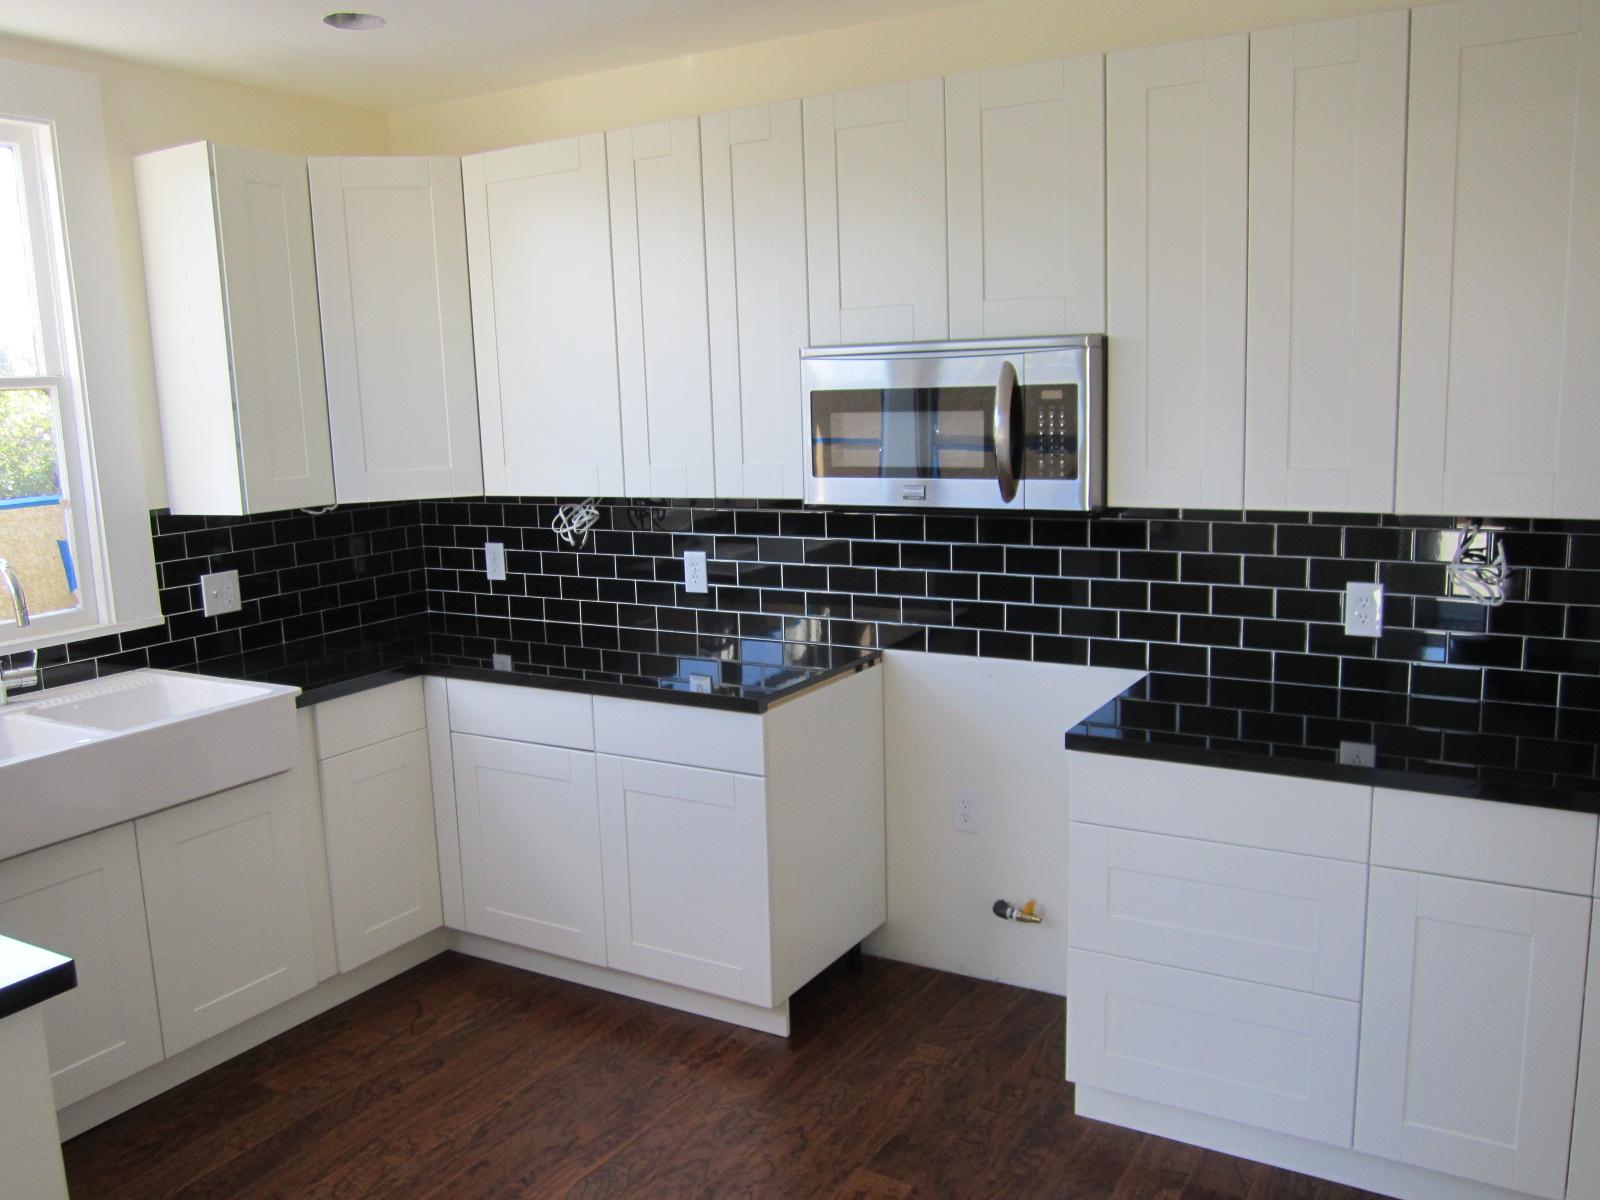 Black-Subway-Tiles-In-Kitchen